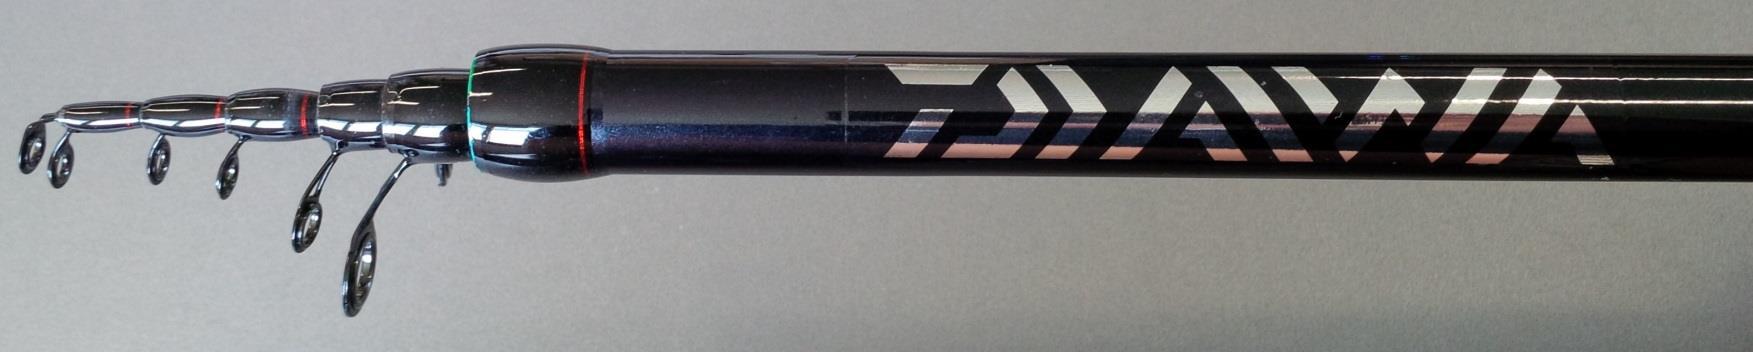 Удилище спиннинговое карповое Daiwa Crossfire, 6 м удилище спиннинговое карповое daiwa crossfire 6 м